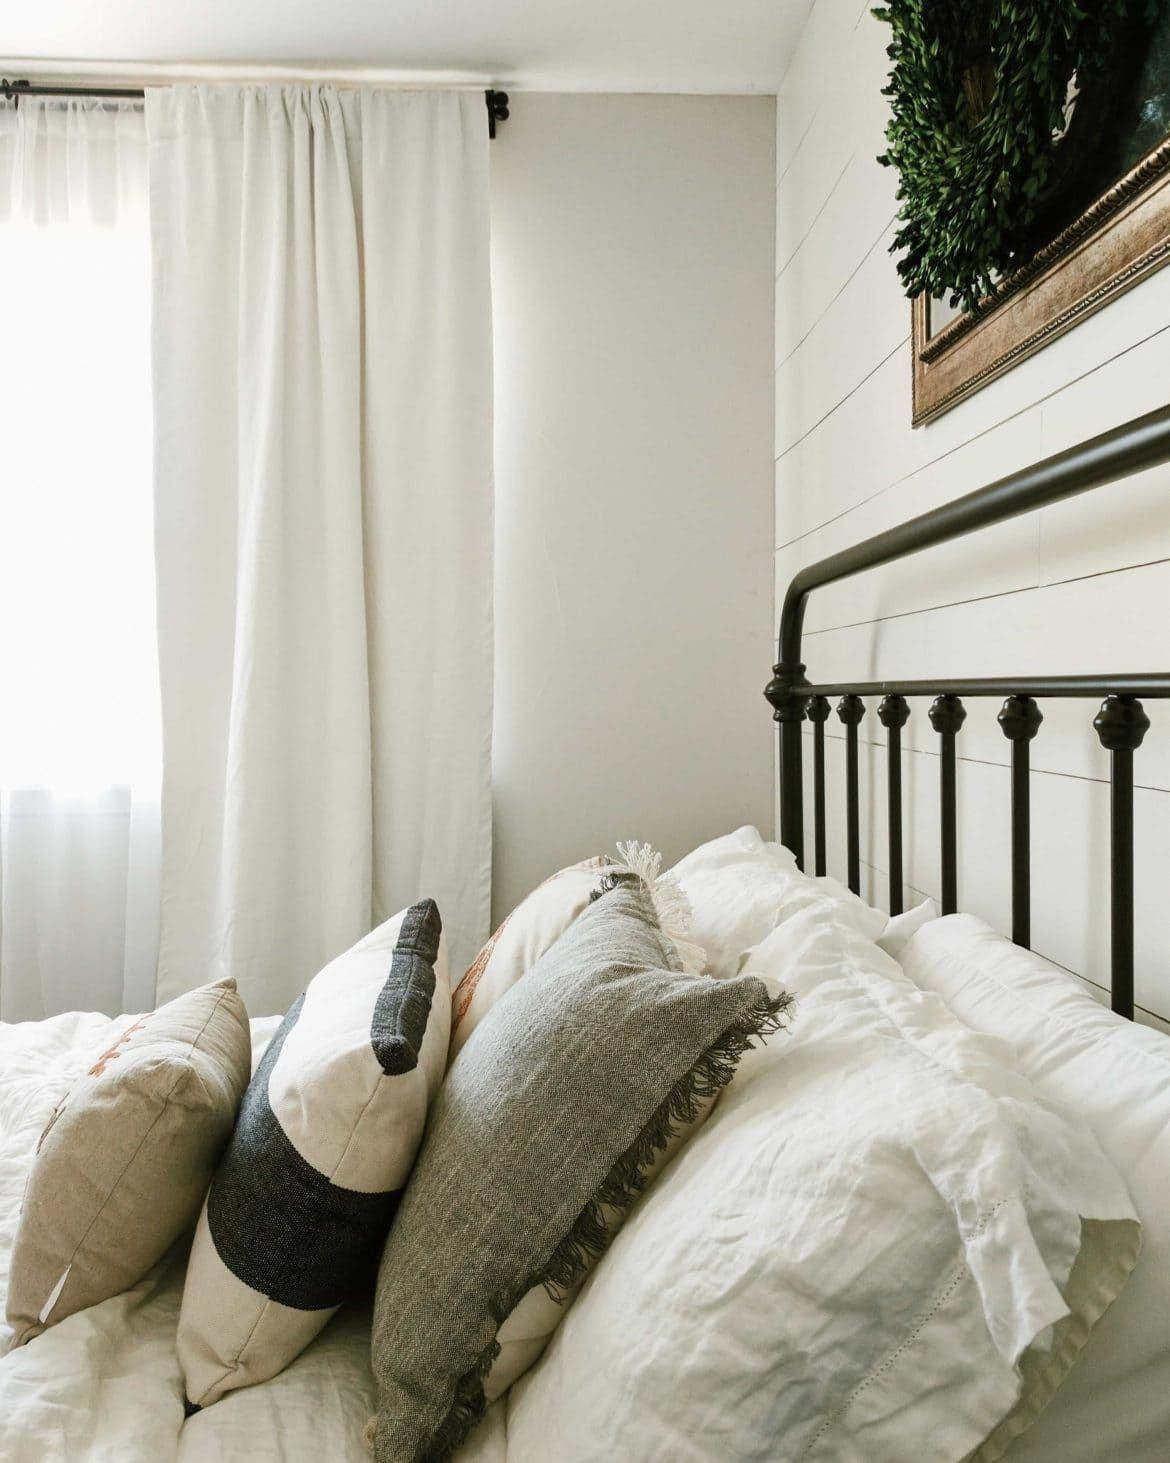 Bedroom Rug | Master Bedroom Ikea | Cosy Bedroom Ideas | Bedroom Style Scandinavian | Contemporary B&; Bedroom Rug | Master Bedroom Ikea | Cosy Bedroom Ideas | Bedroom Style Scandinavian | Contemporary B&; Romantic Master Bedroom[…]  #Bedroom #contemporary #cosy #Ideas #Ikea #Master #rug #Scandinavian #small guest room with desk #Style